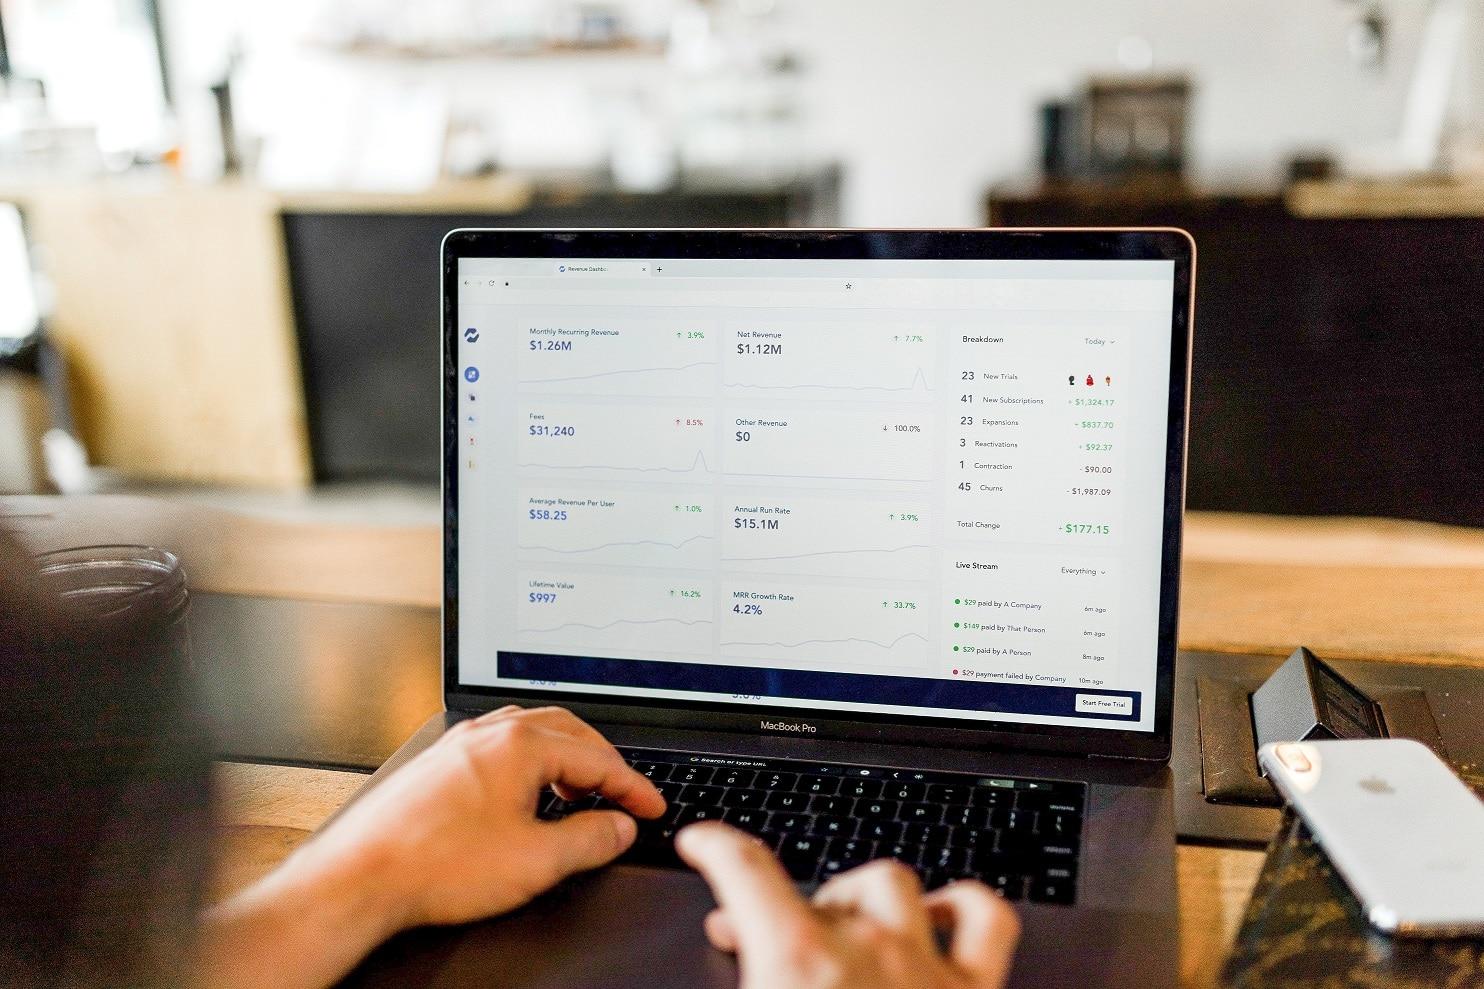 make a money transfer abroad online